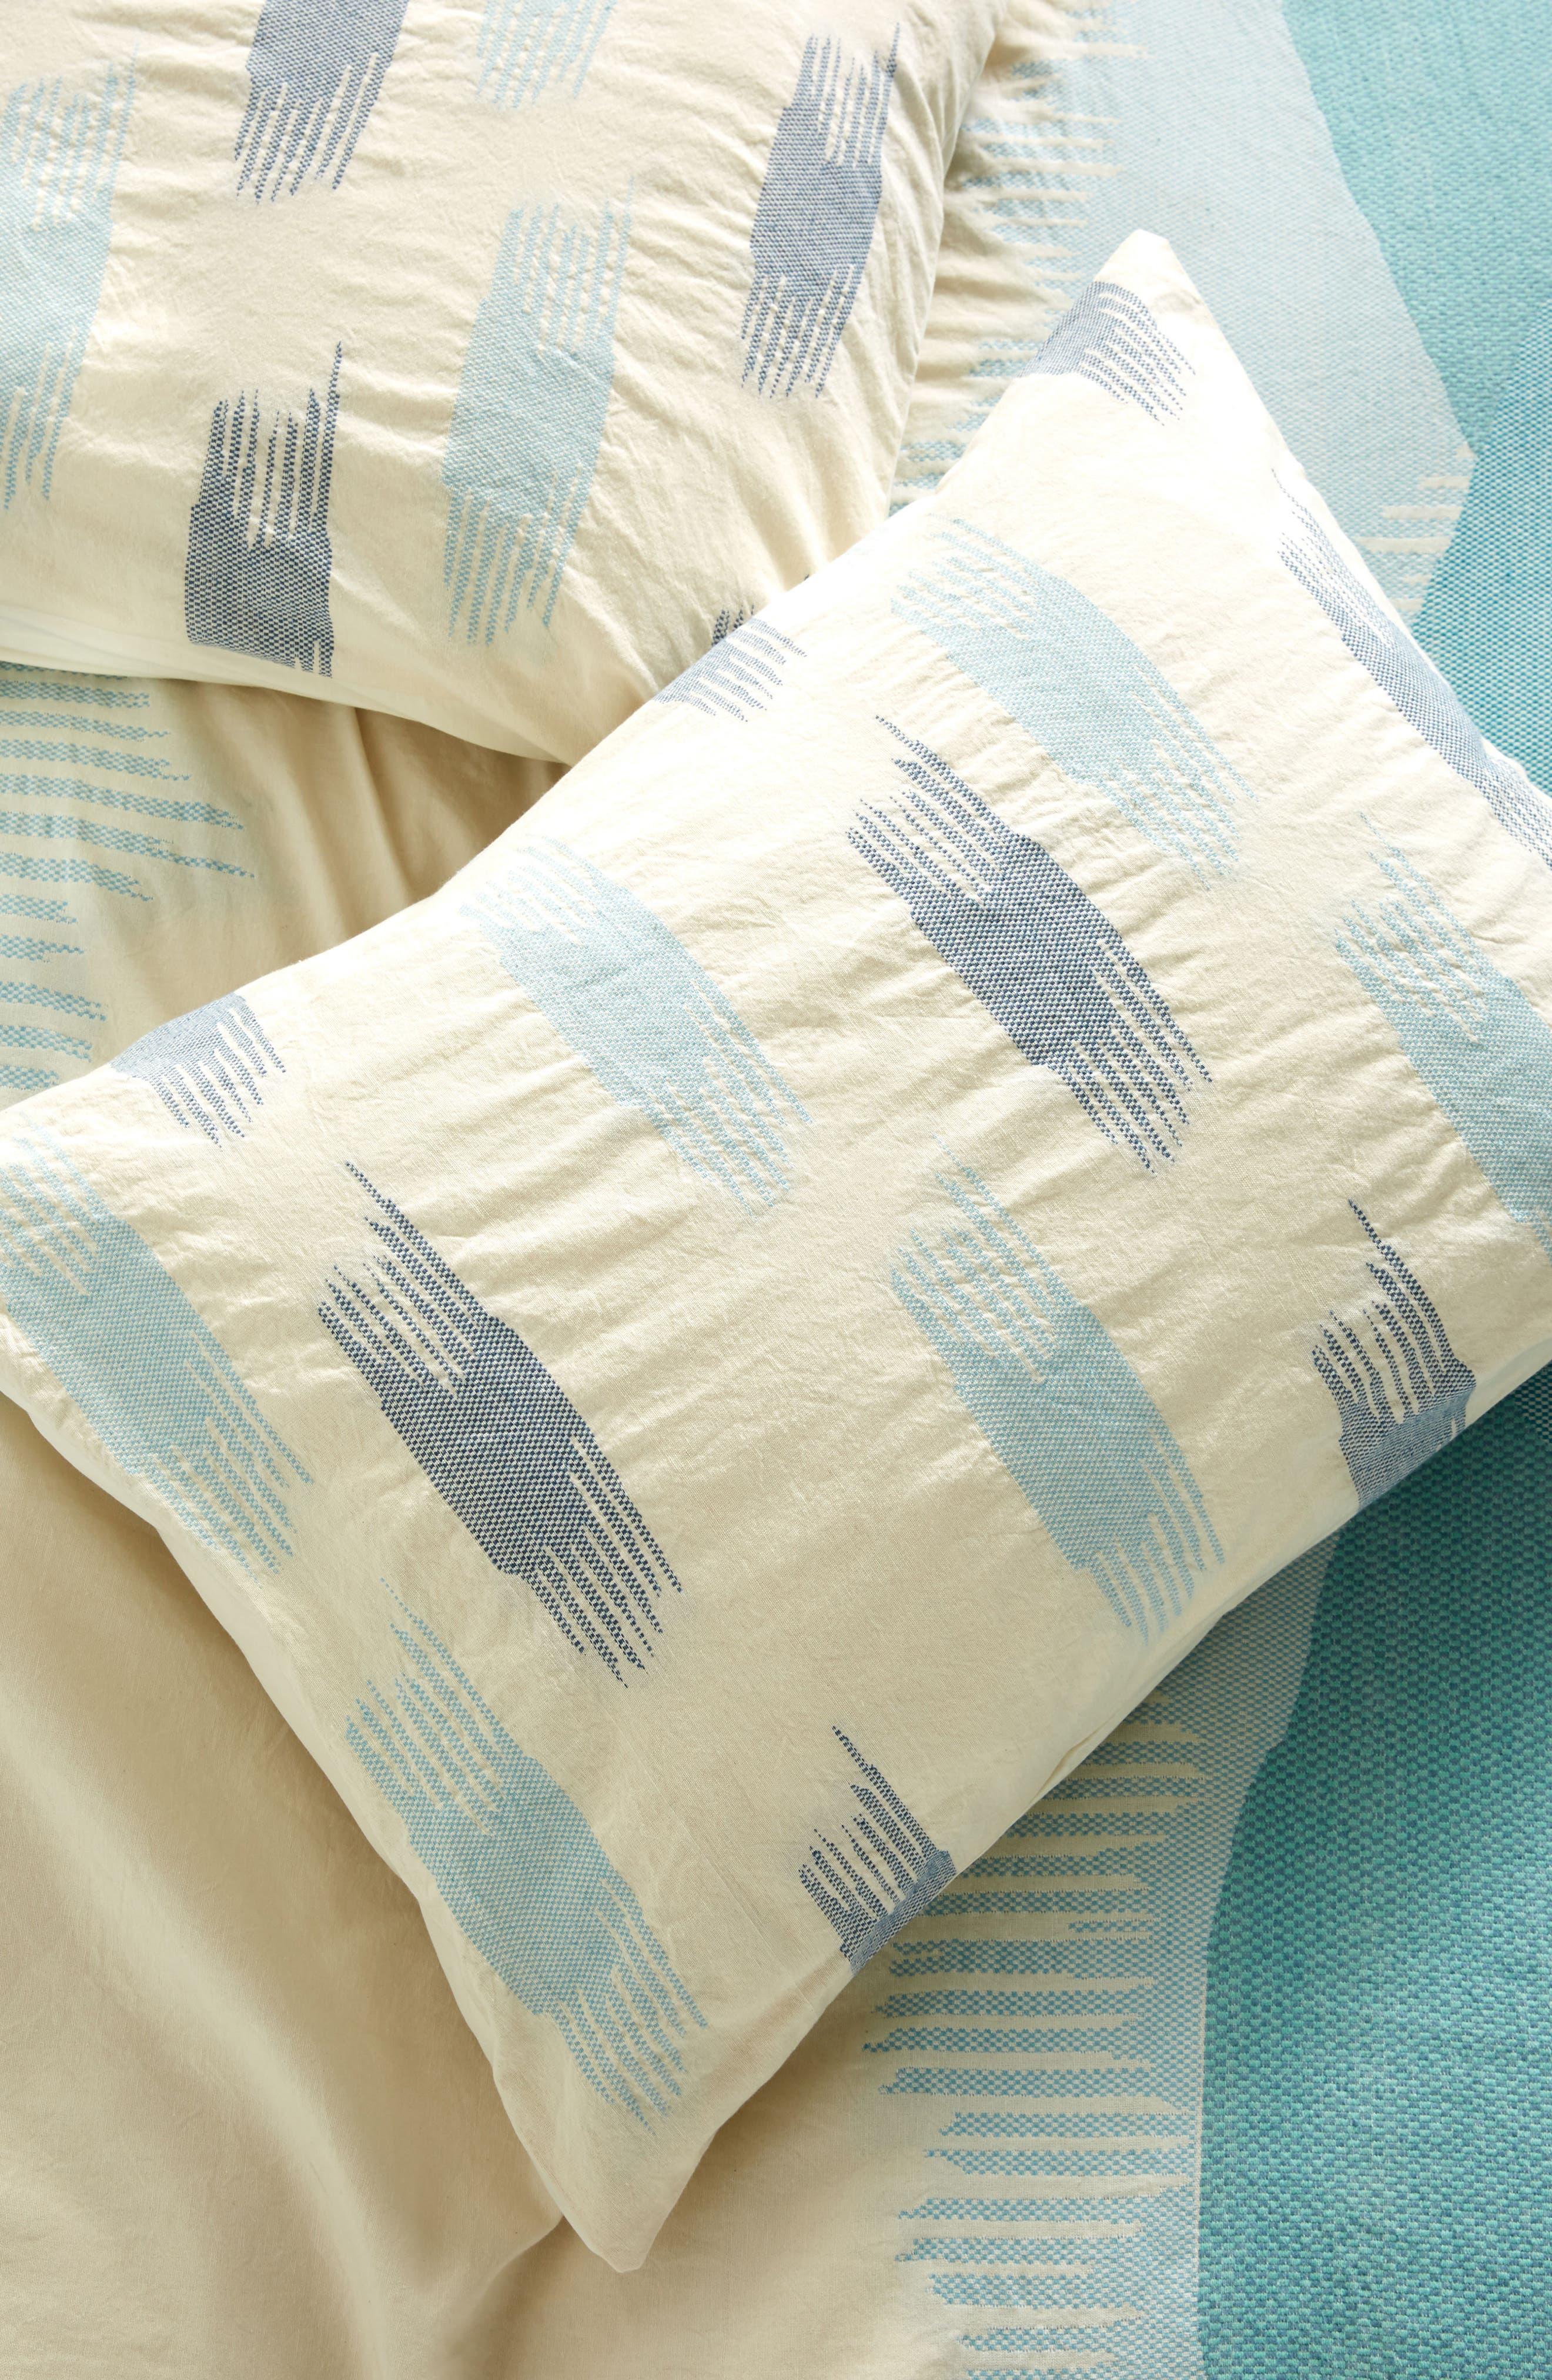 Alternate Image 1 Selected - Anthropologie Woven Calera Pillow Shams